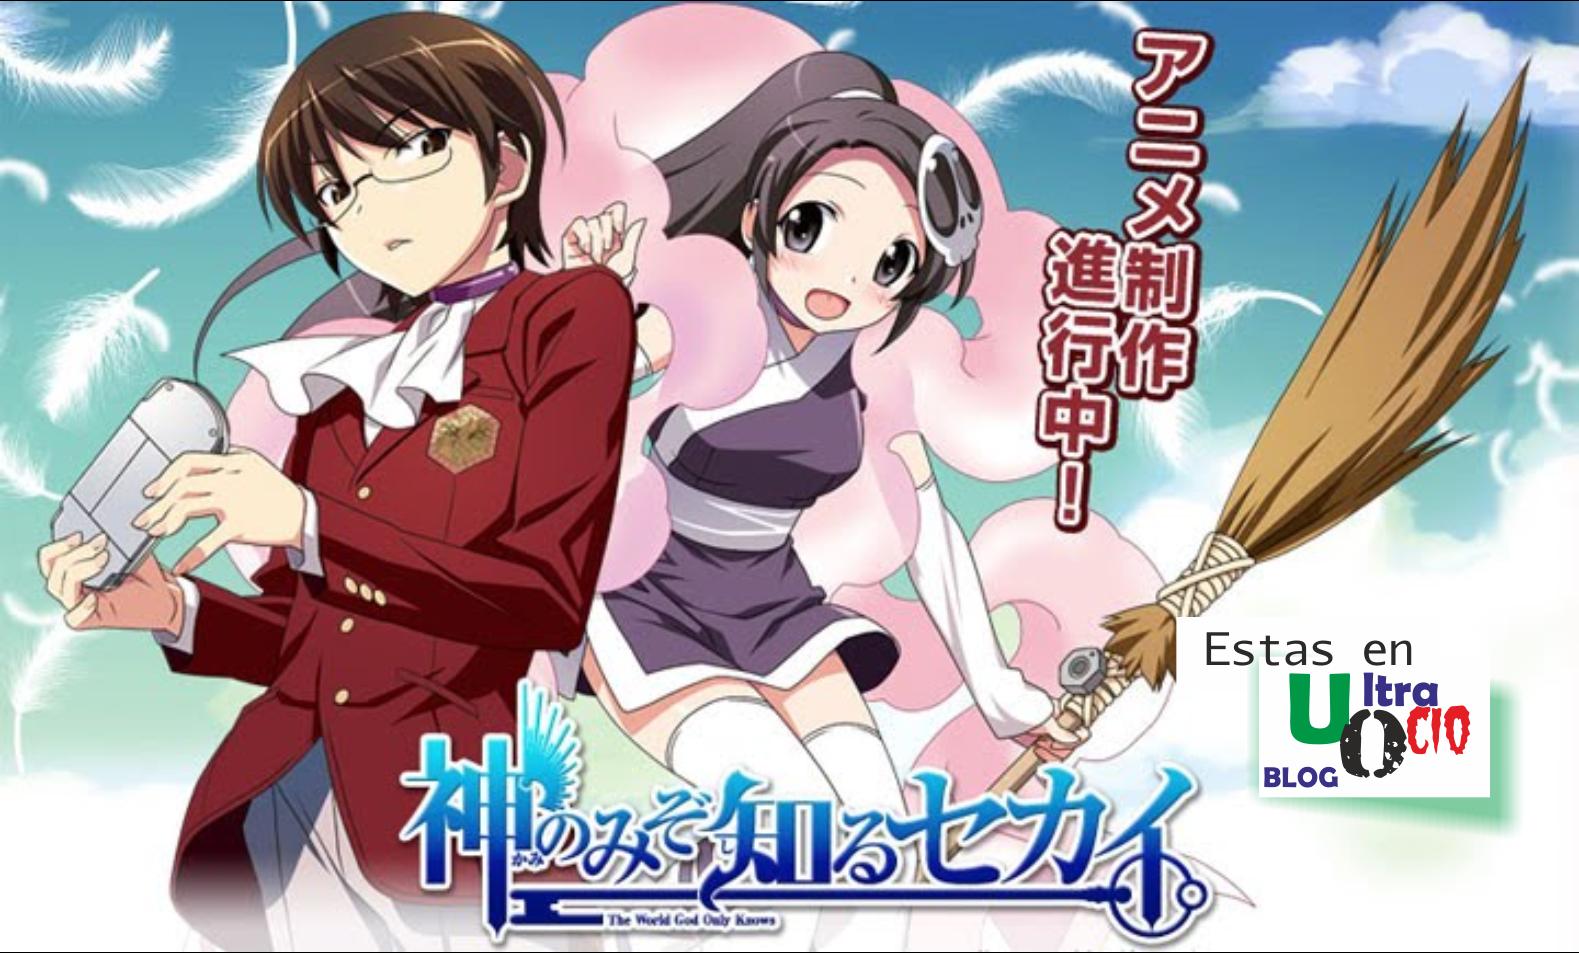 anime romance comedia